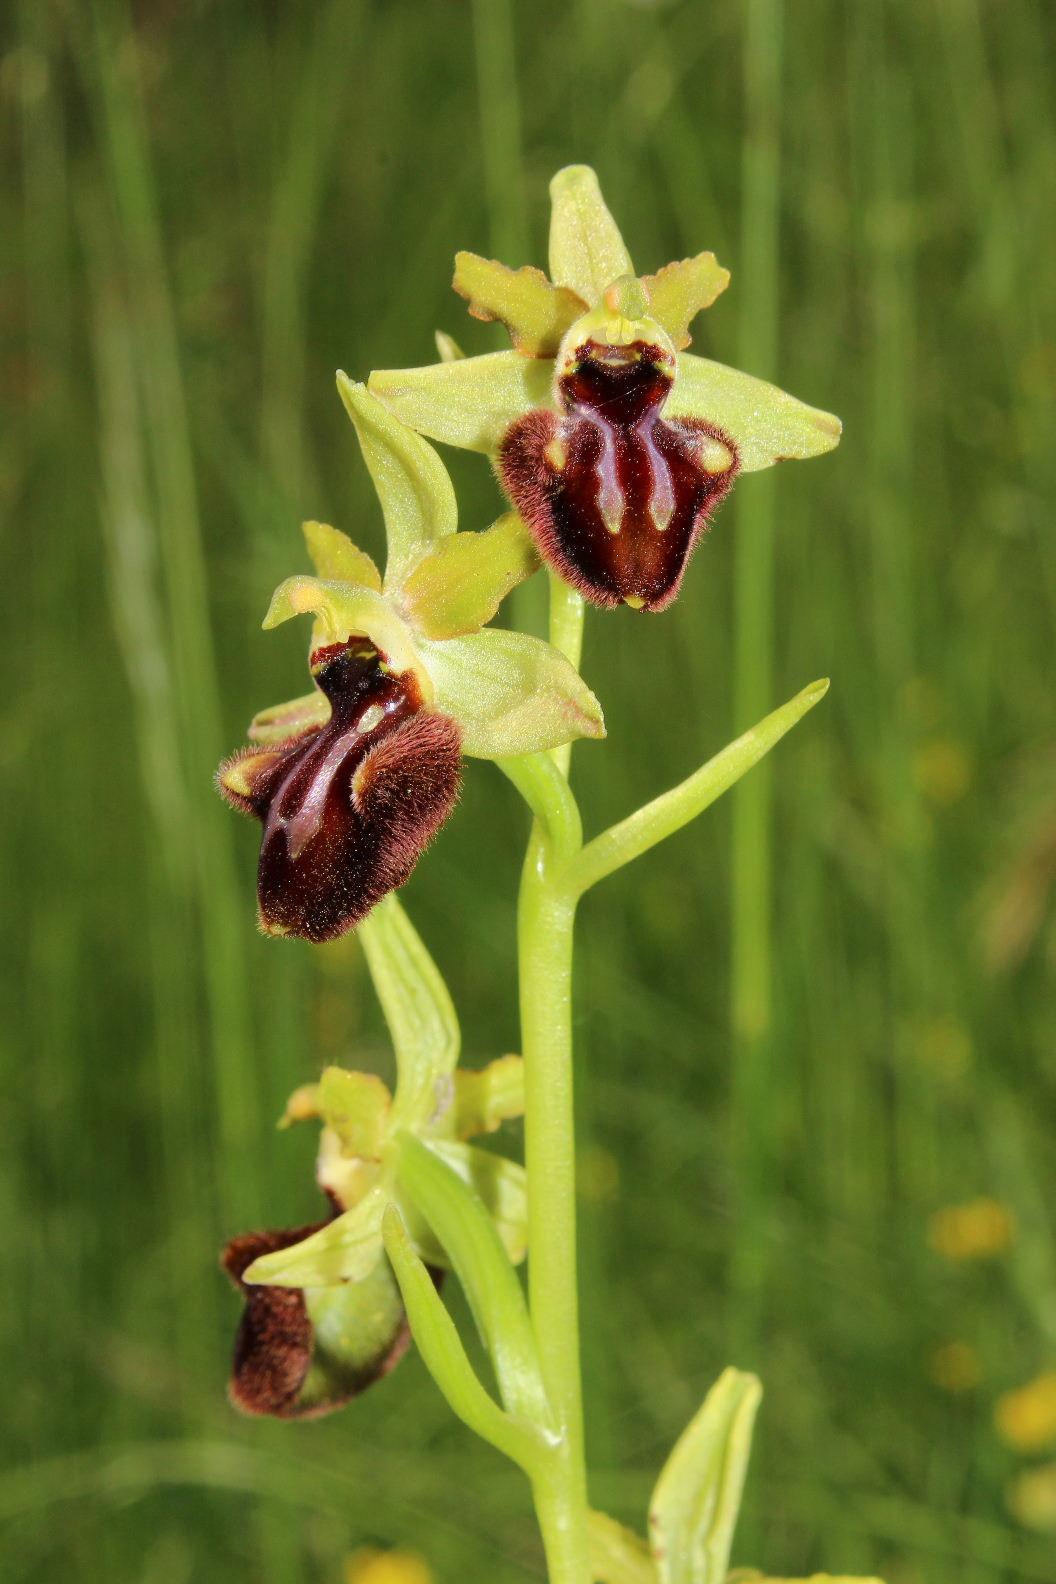 Orchidee varie prov. Cuneo e savona